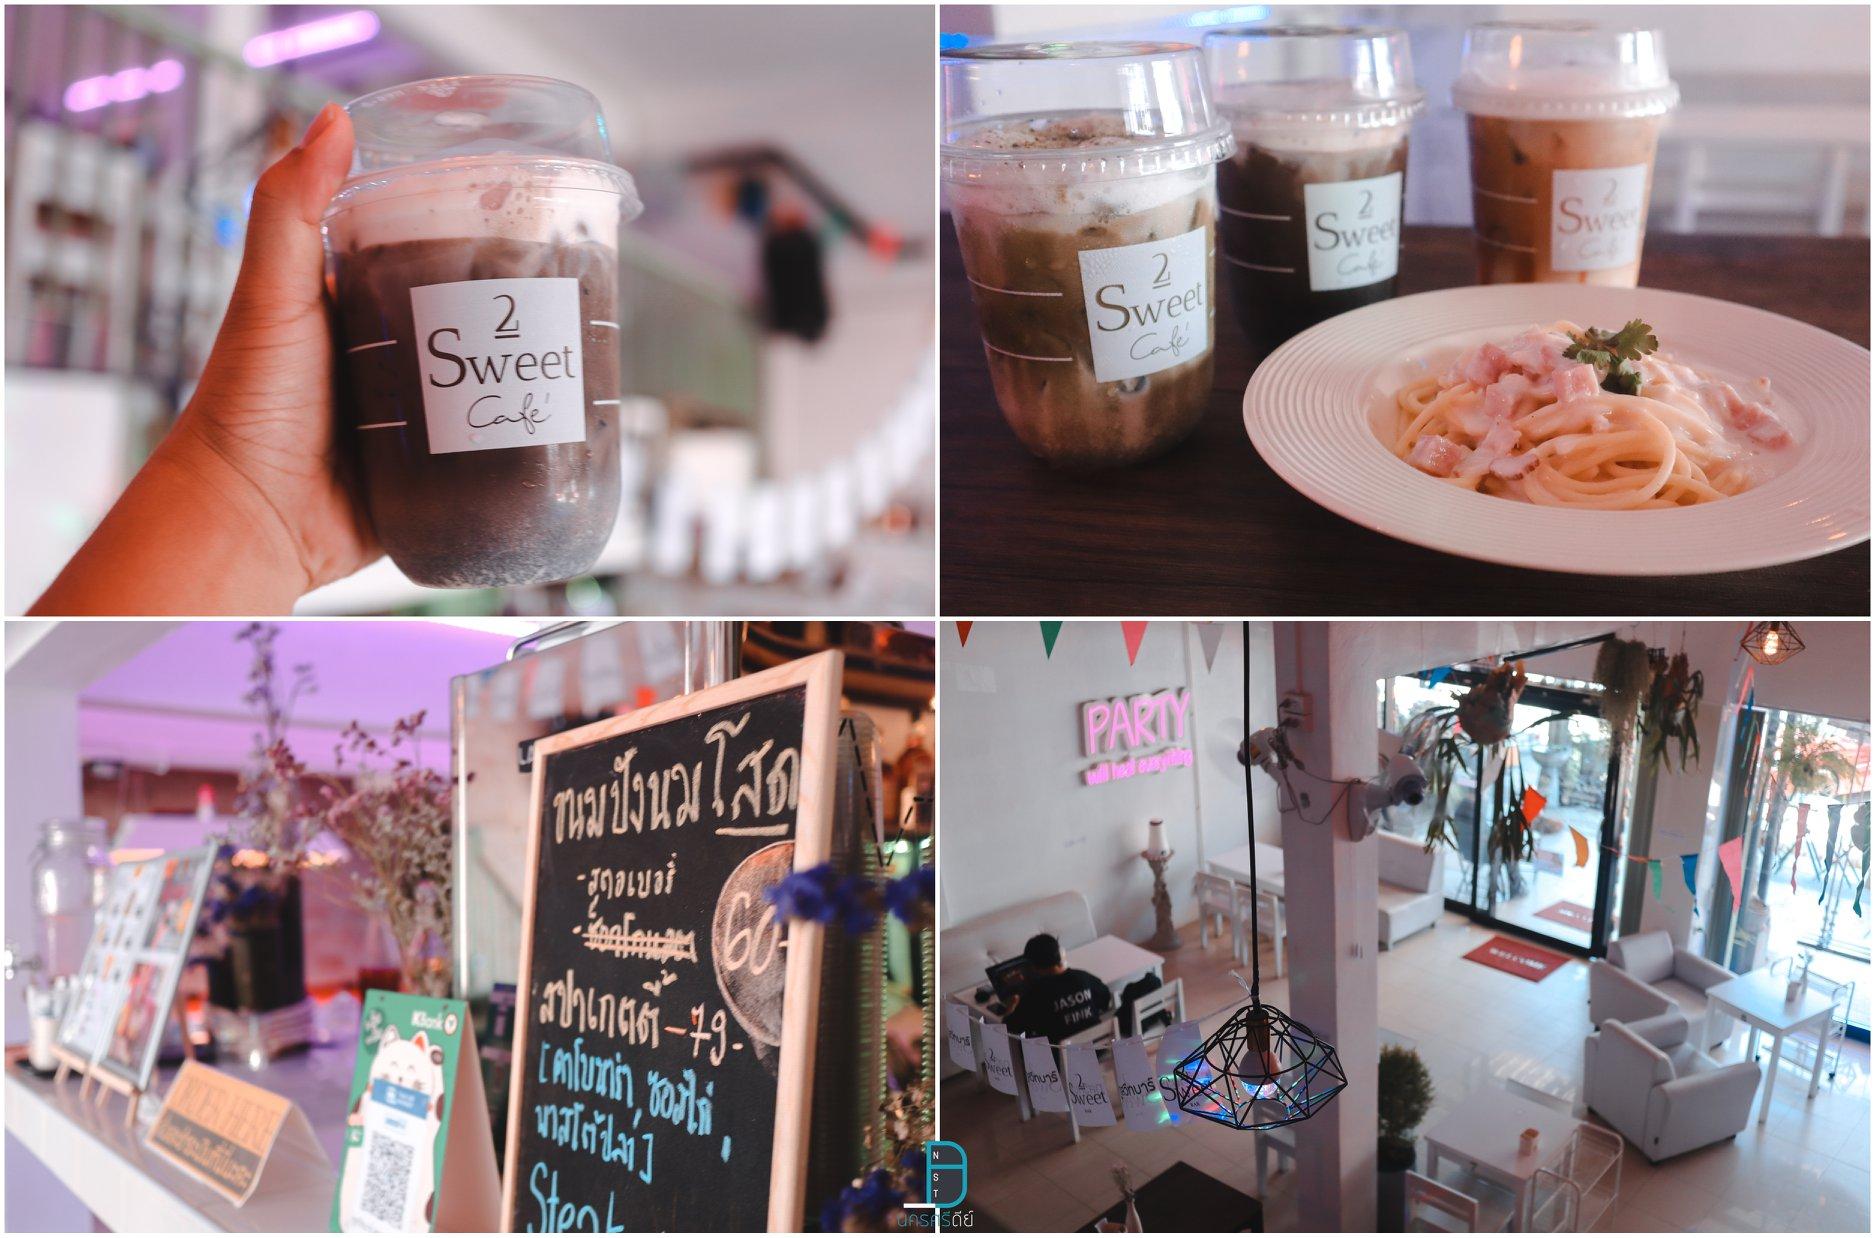 11.-2-sweet-cafe คลิกที่นี่ คาเฟ่,Cafe,นครศรีธรรมราช,2020,2563,ของกิน,จุดเช็คอิน,จุดถ่ายรูป